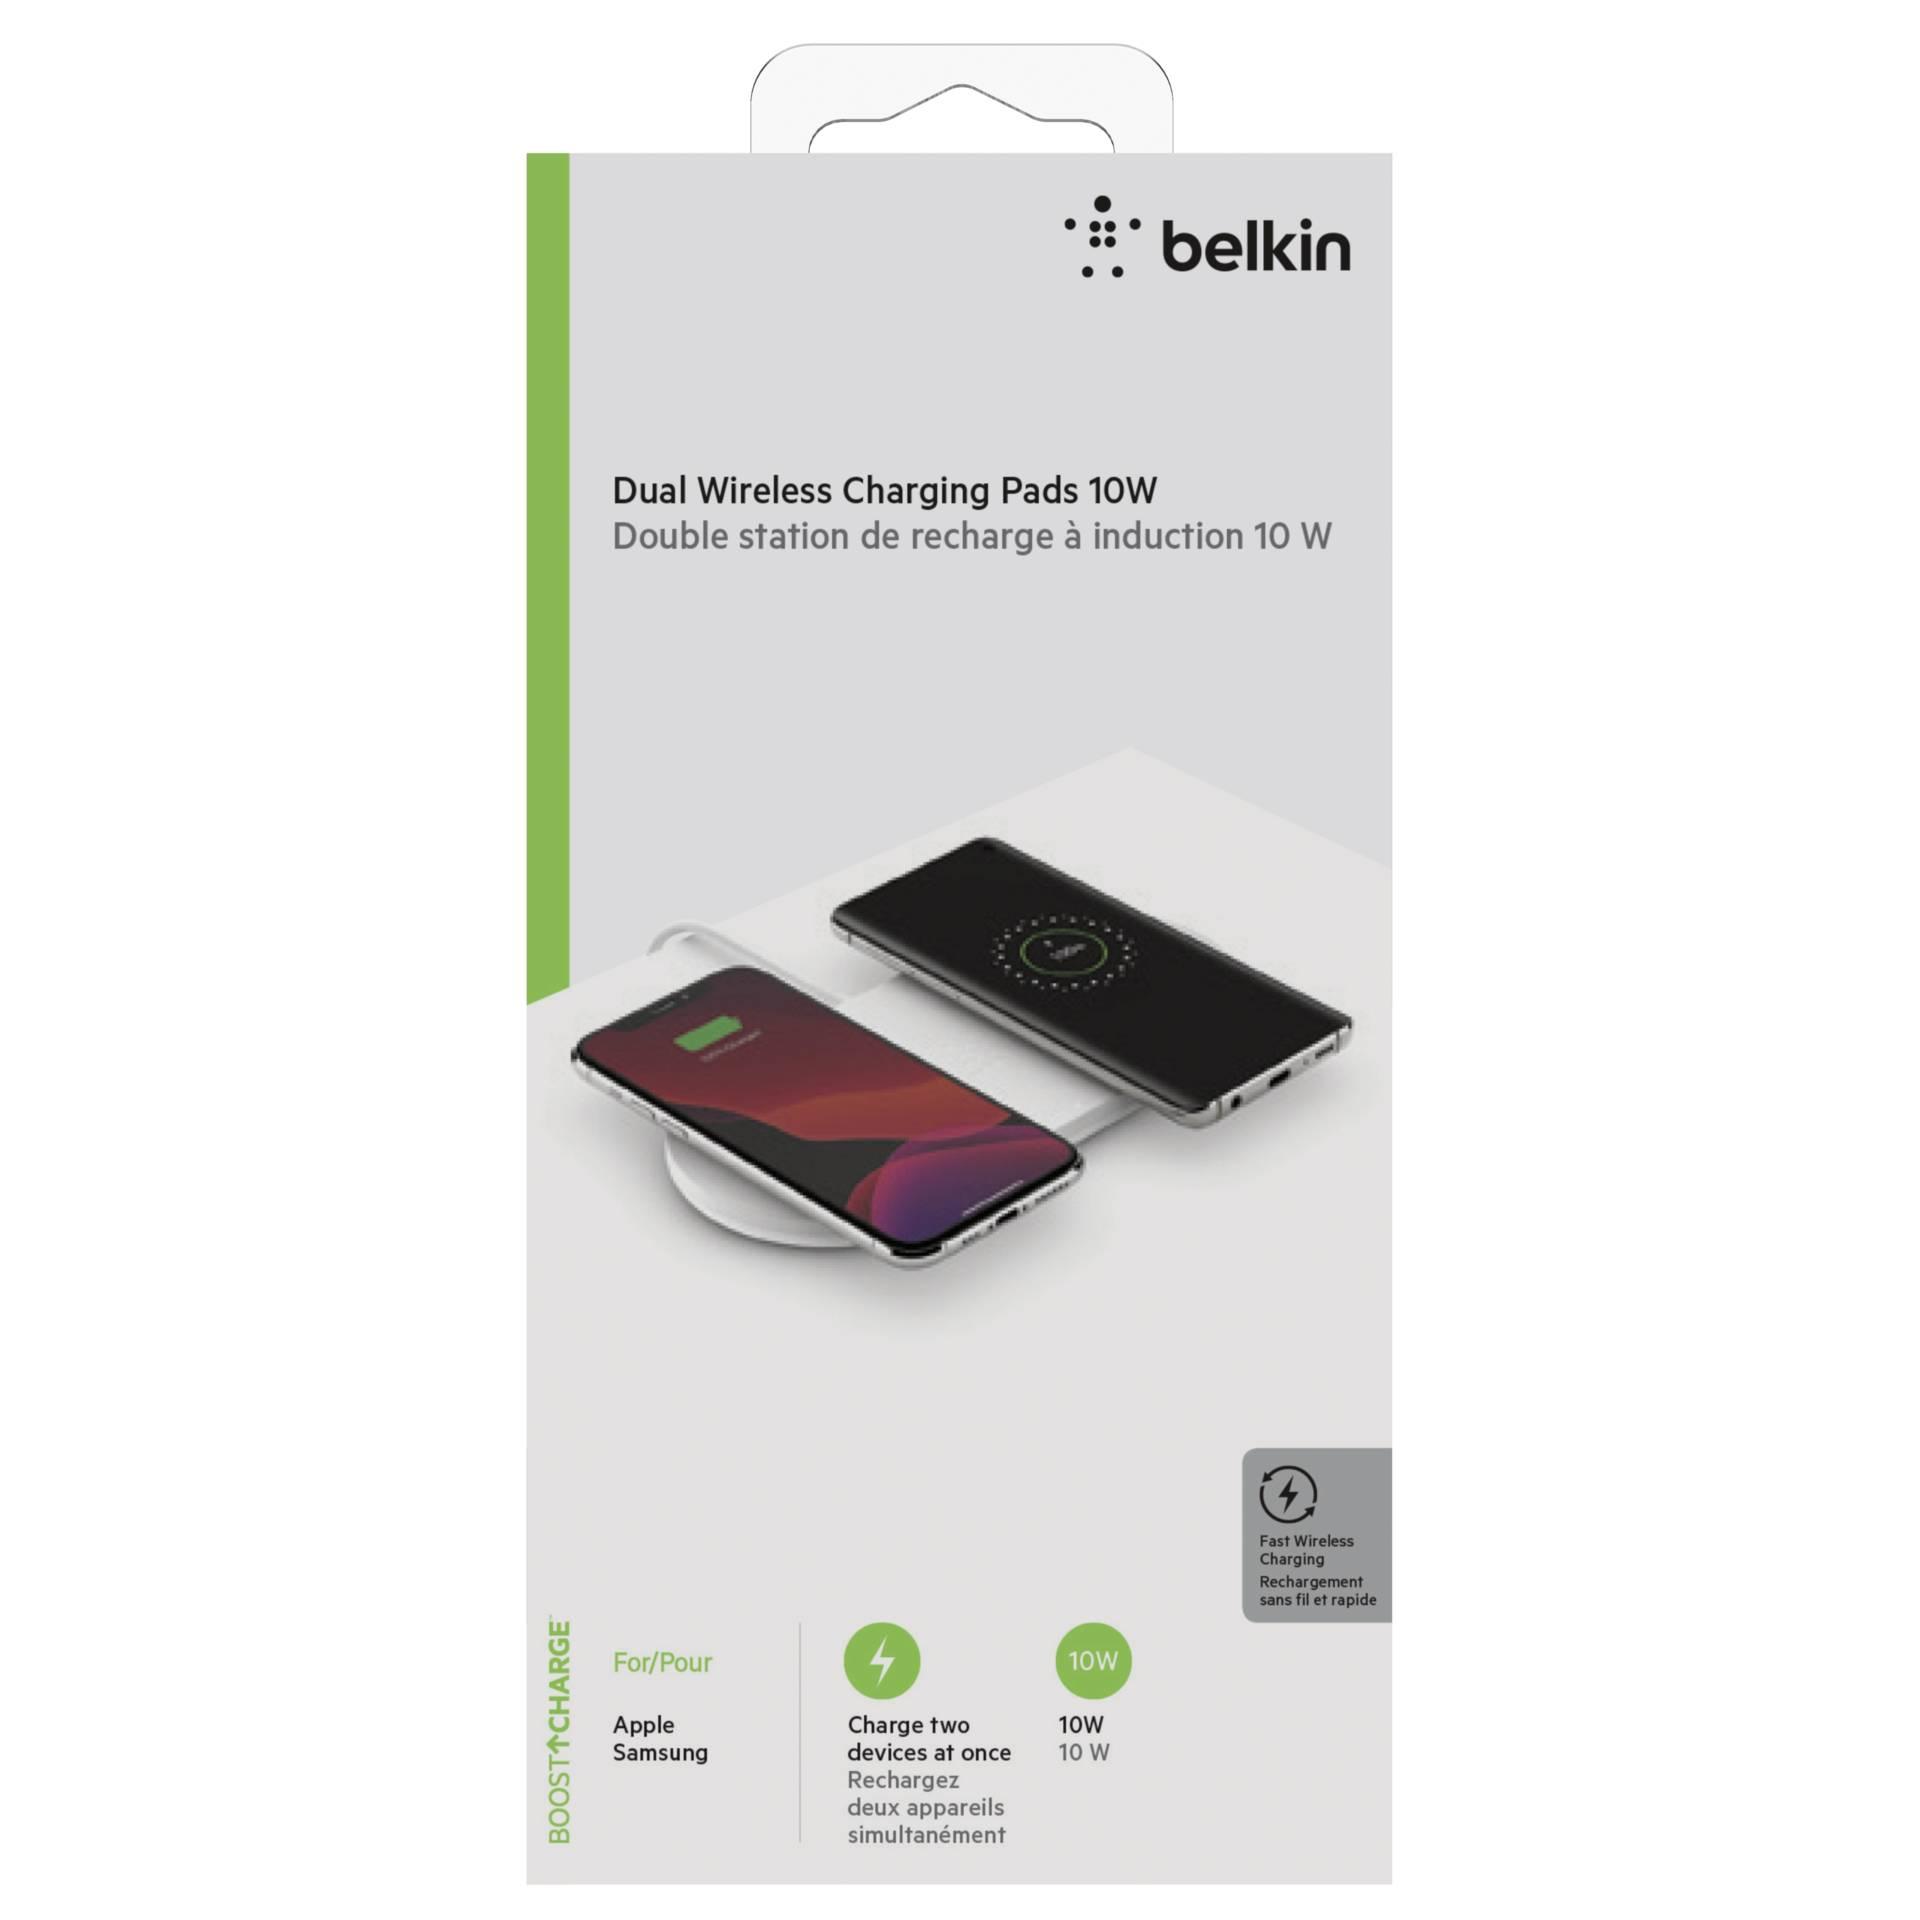 Belkin Dual wirel. Charging Pad 2x10W Netzteil weiß   WIZ002vfWH